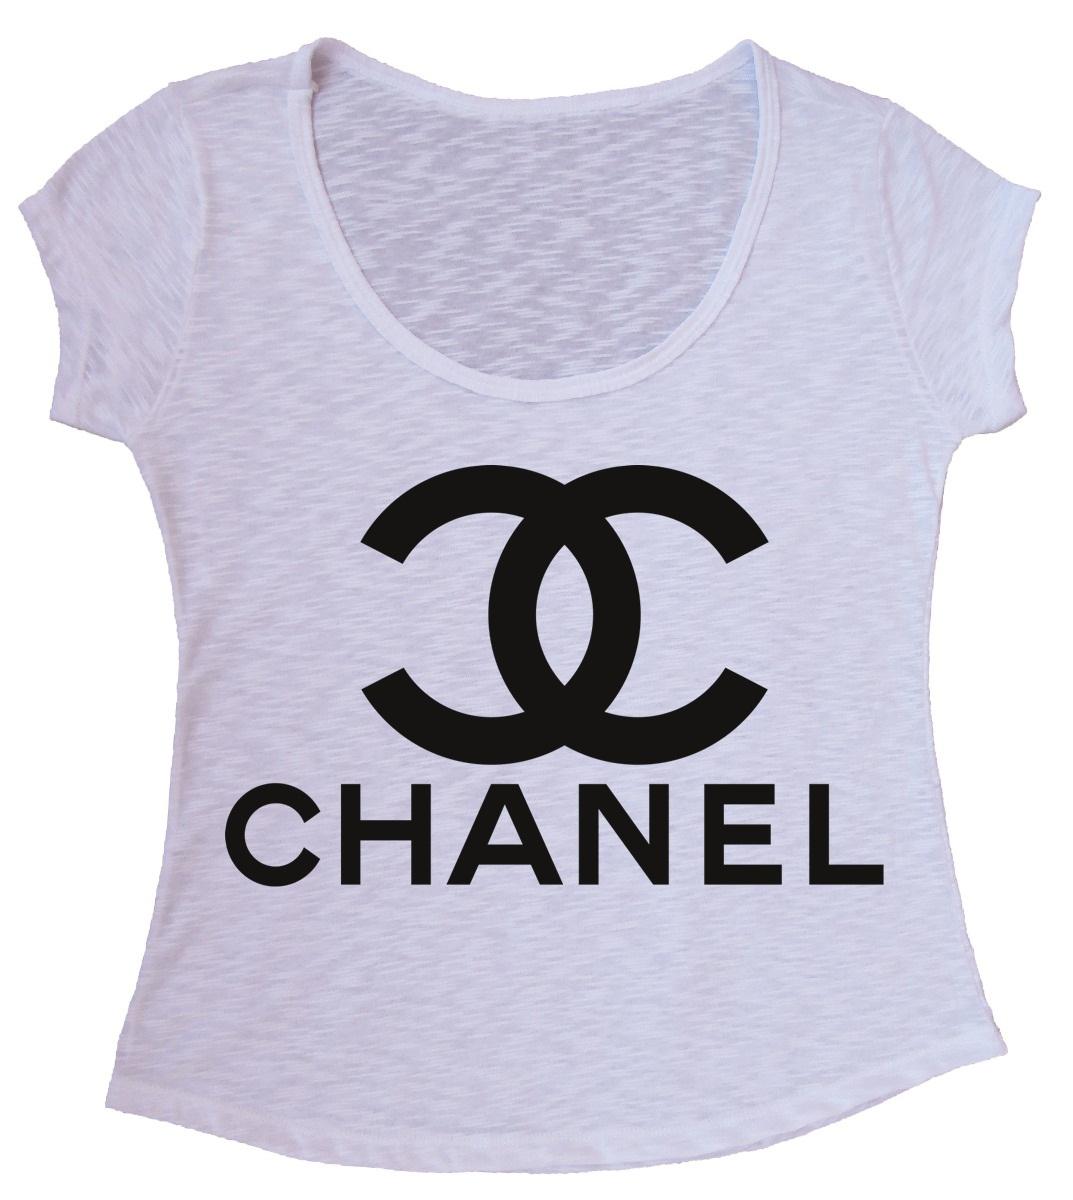 a0ef706a0c Blusa T Shirt Mãe Coruja Personalizada no Elo7